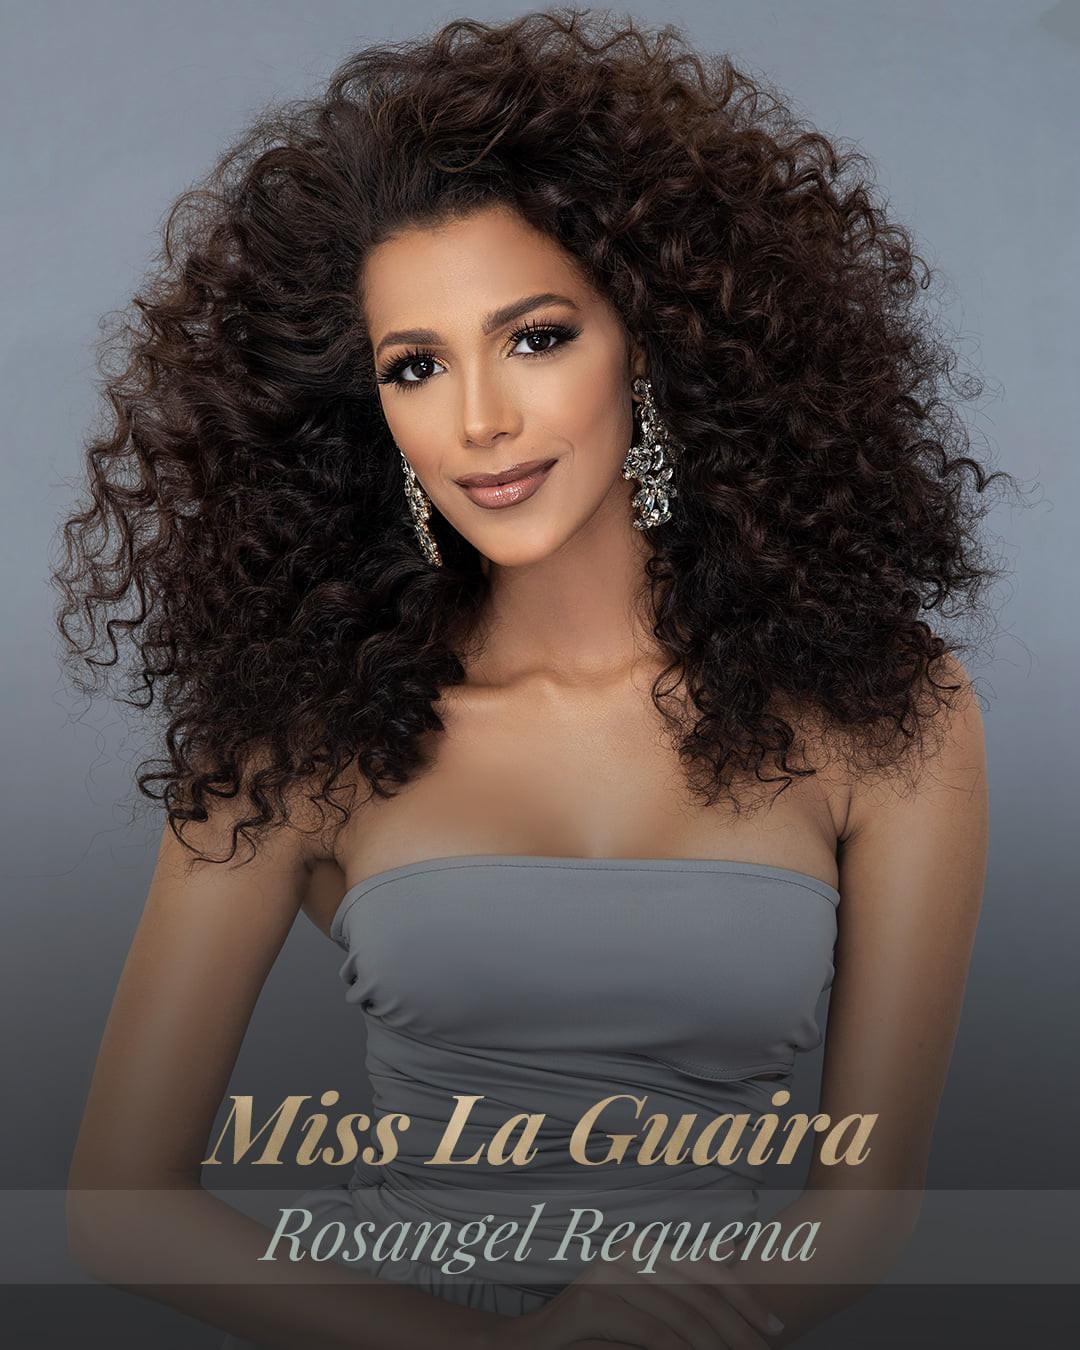 candidatas a miss venezuela 2021. final: 28 oct. RVKKFV